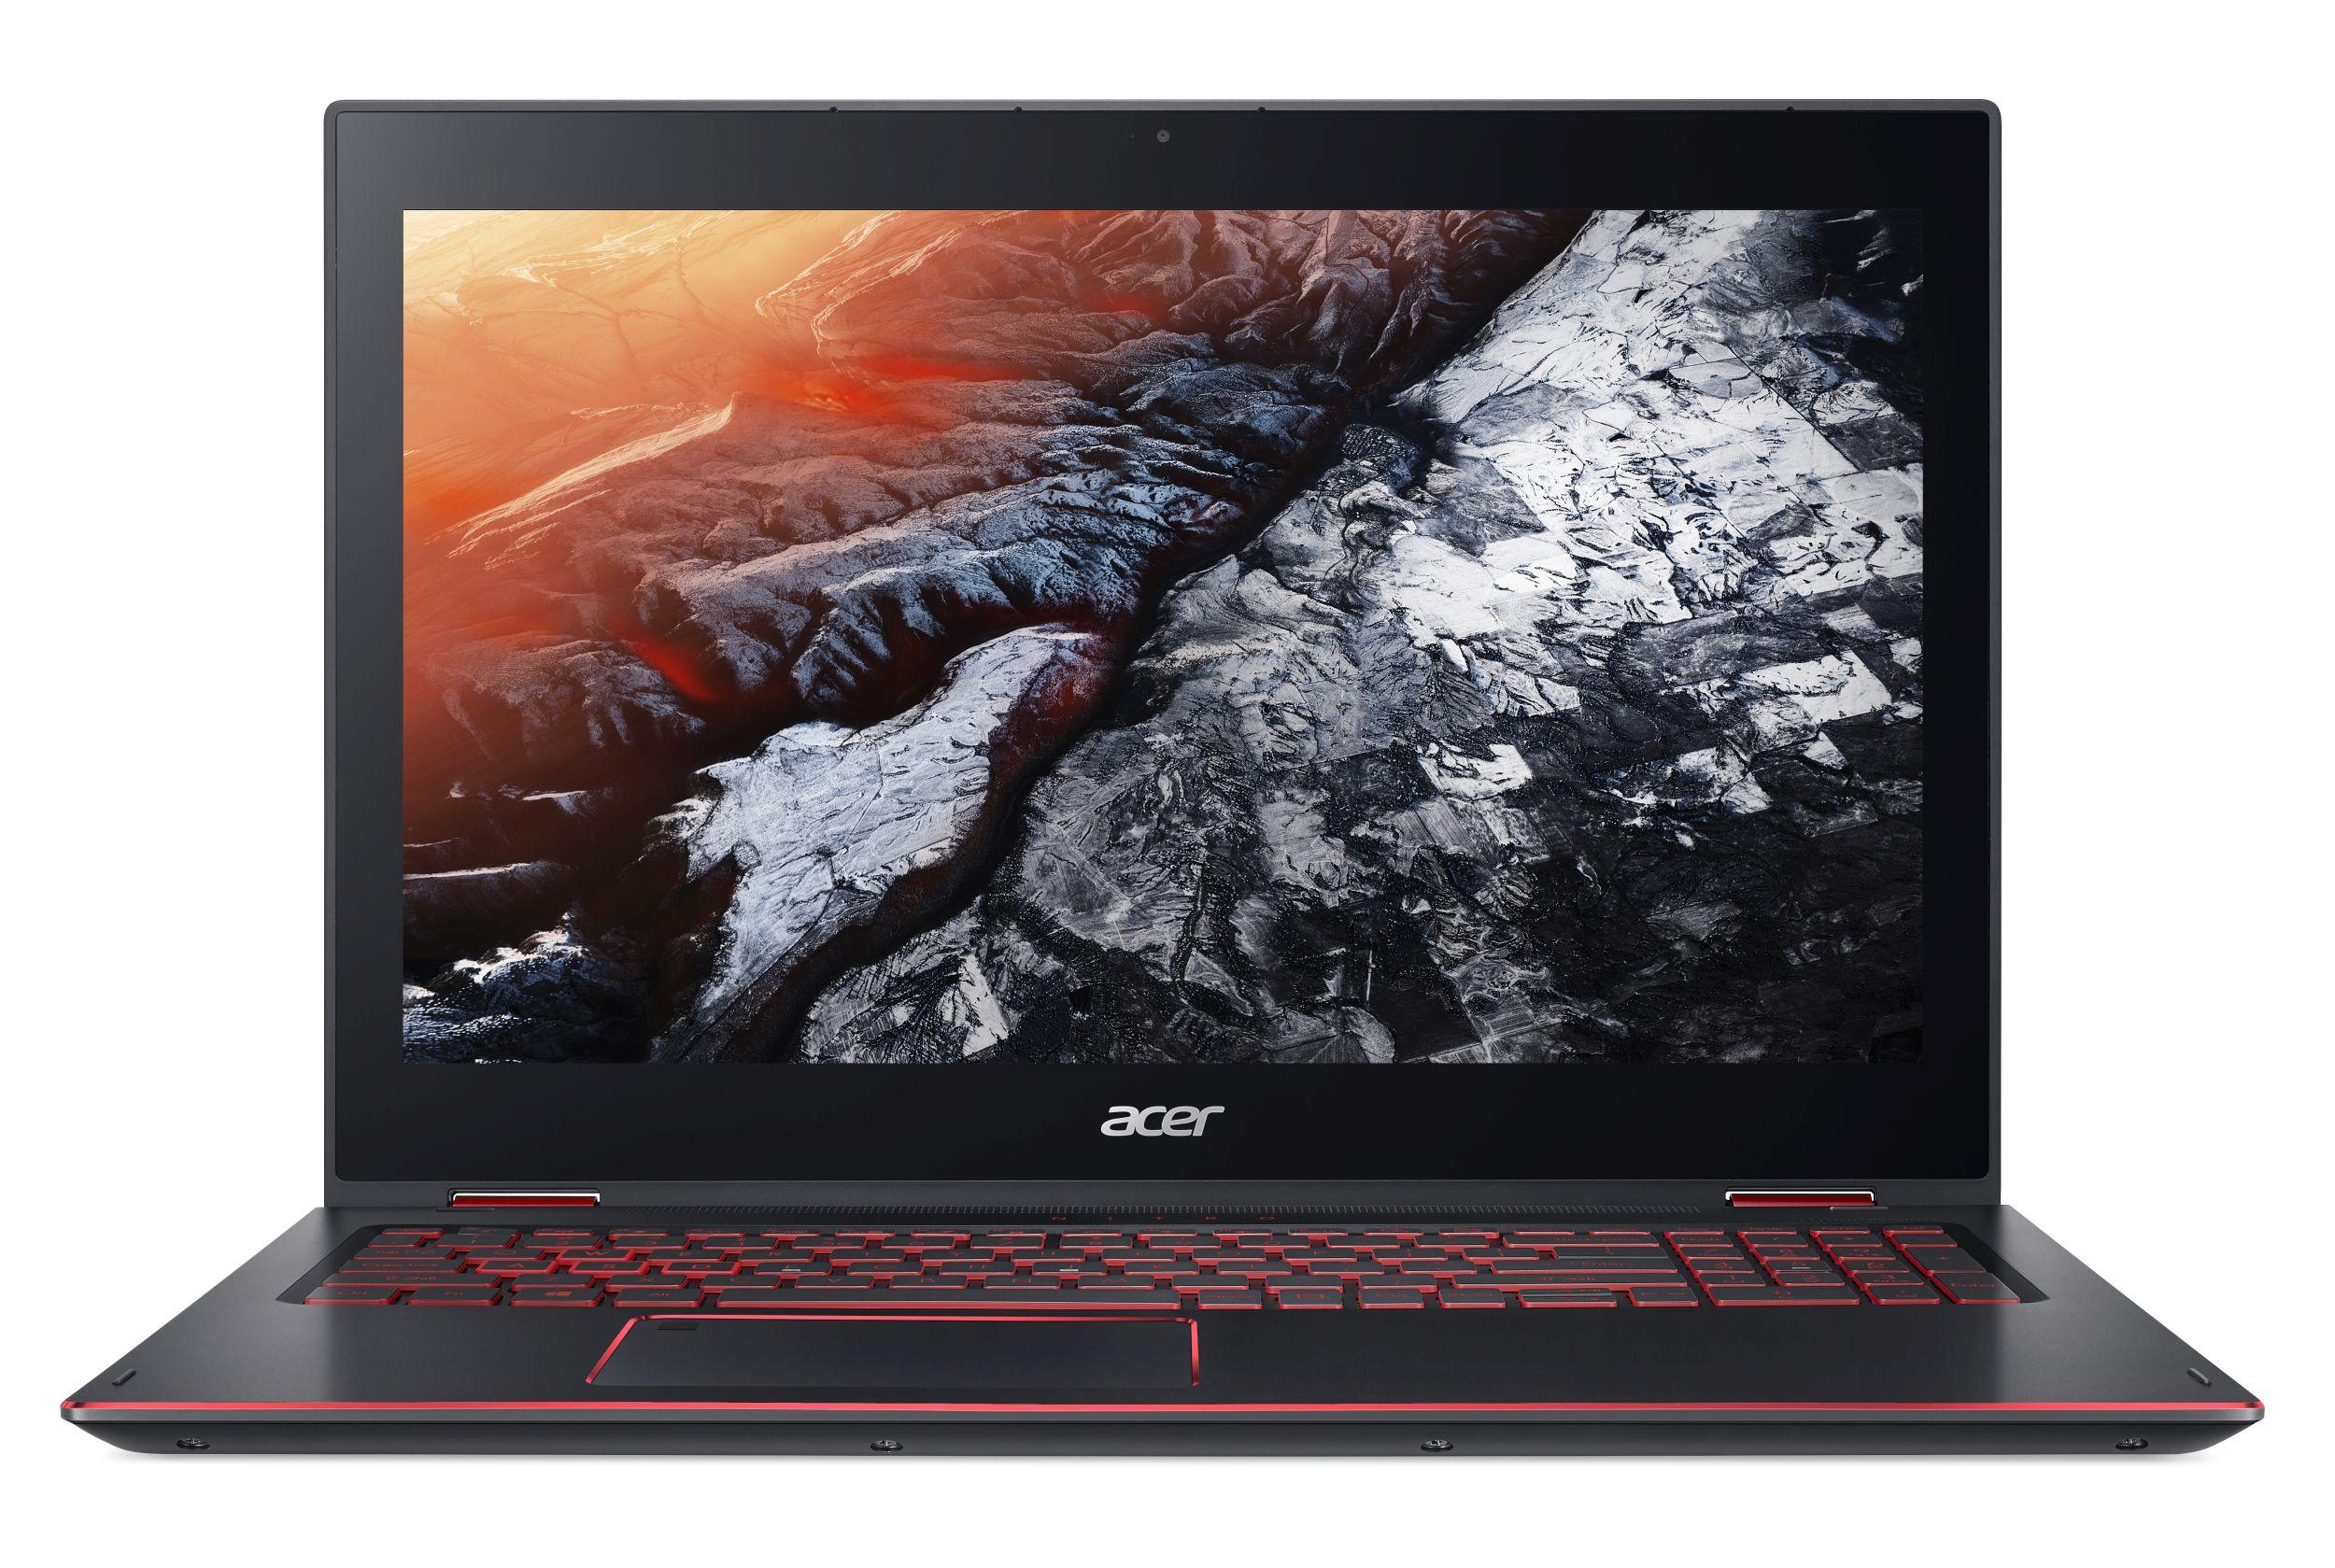 "Acer Nitro 5 Spin (NP515-51-84FZ) Core™ i7-8550U/16GB/512GB SSD+2TB/15.6"" FHD IPS Mulit-Touch LCD/GF FTX 1050/ W10 Home/Black"